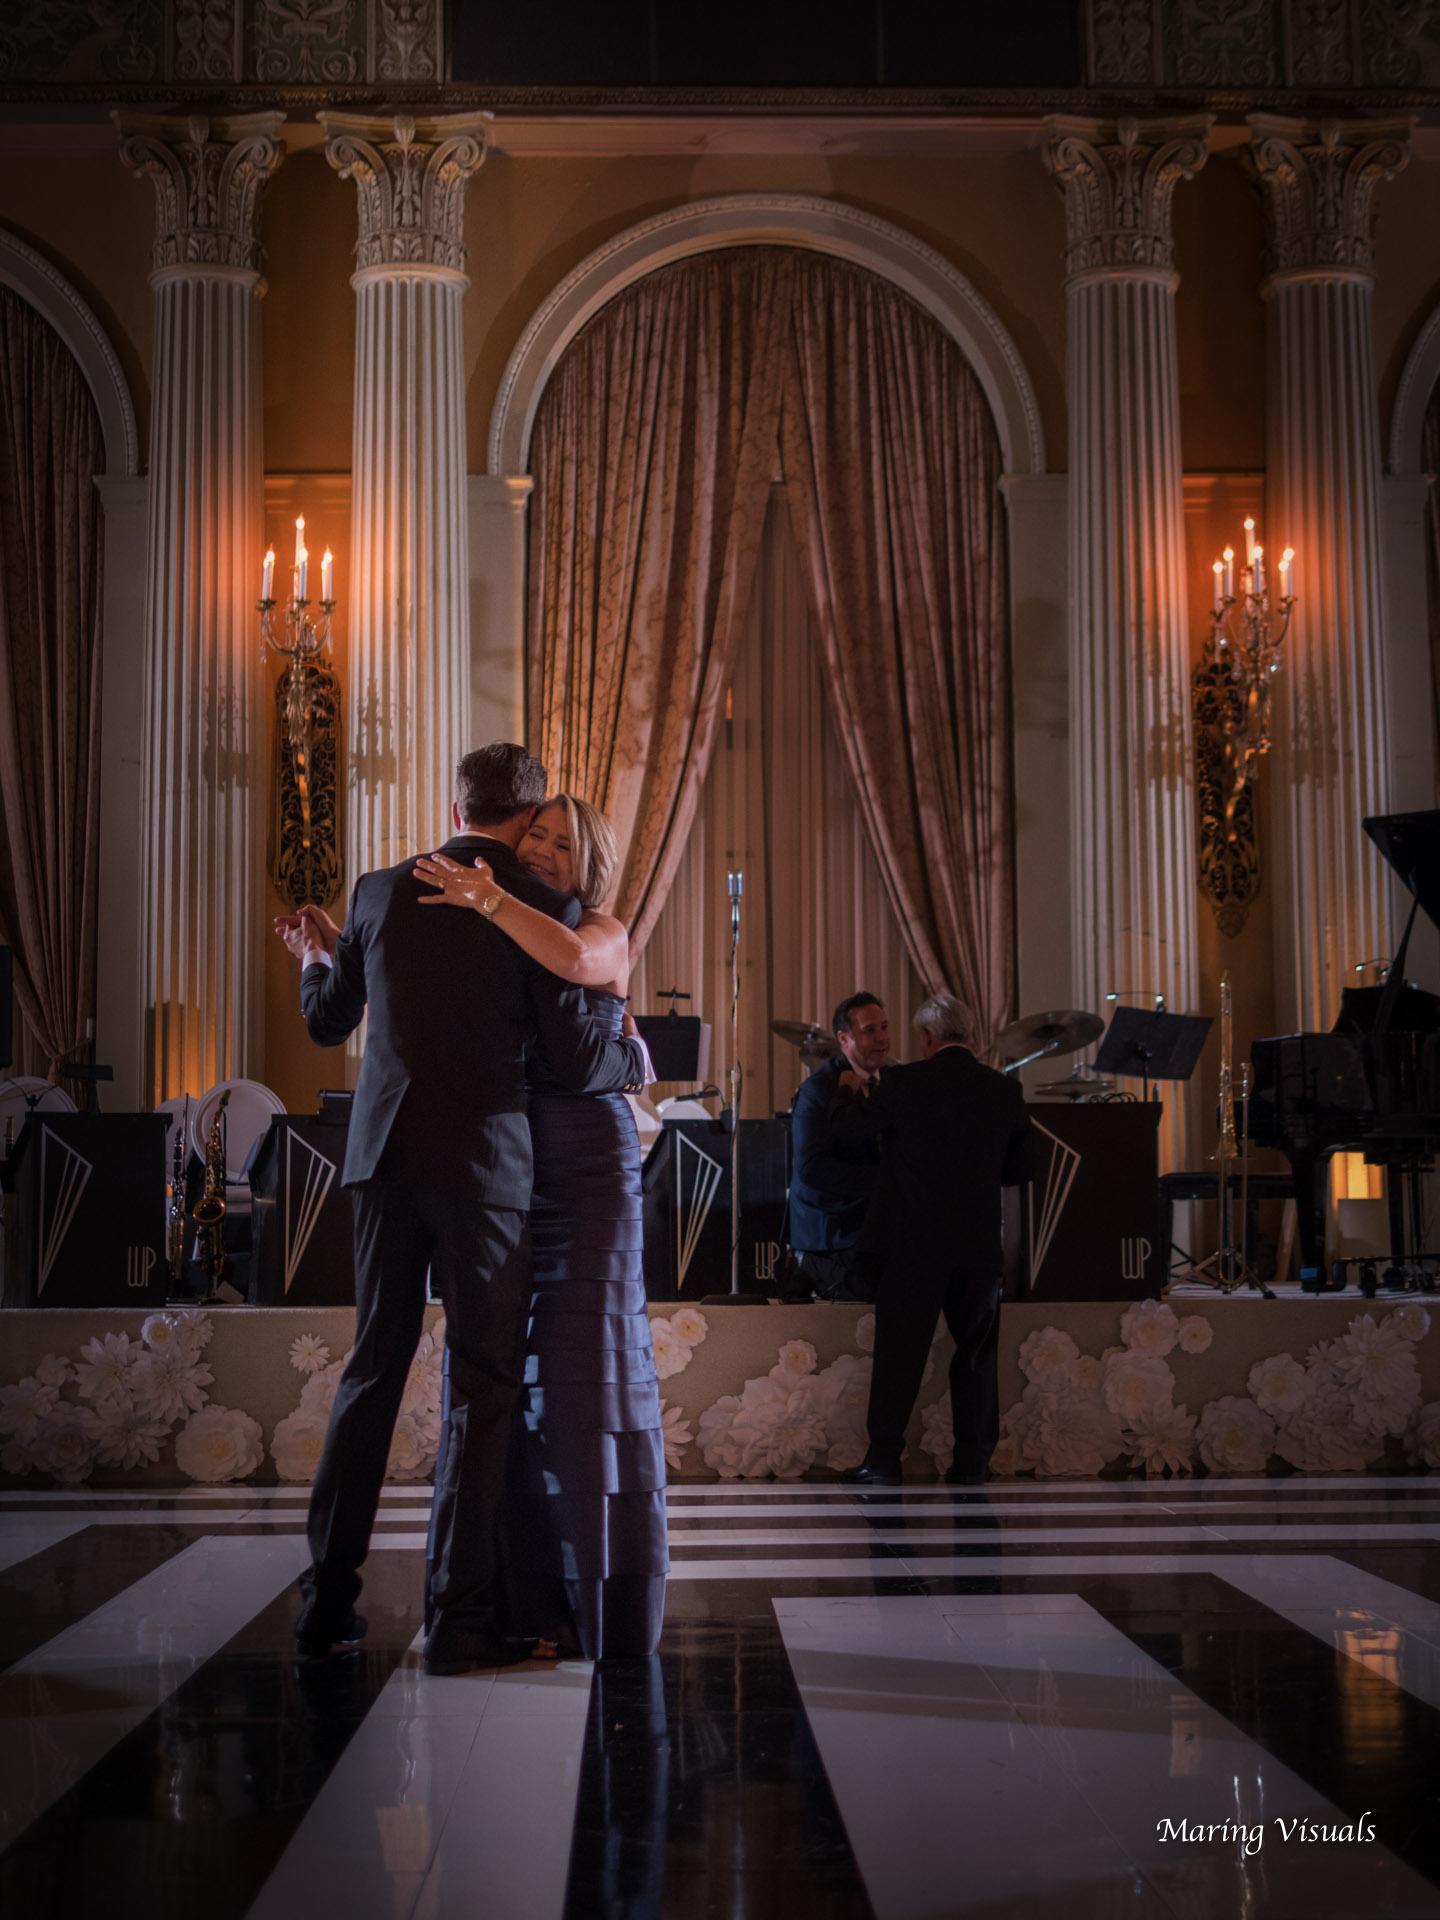 David Tutera Weddings by Maring Visuals 00569.jpg